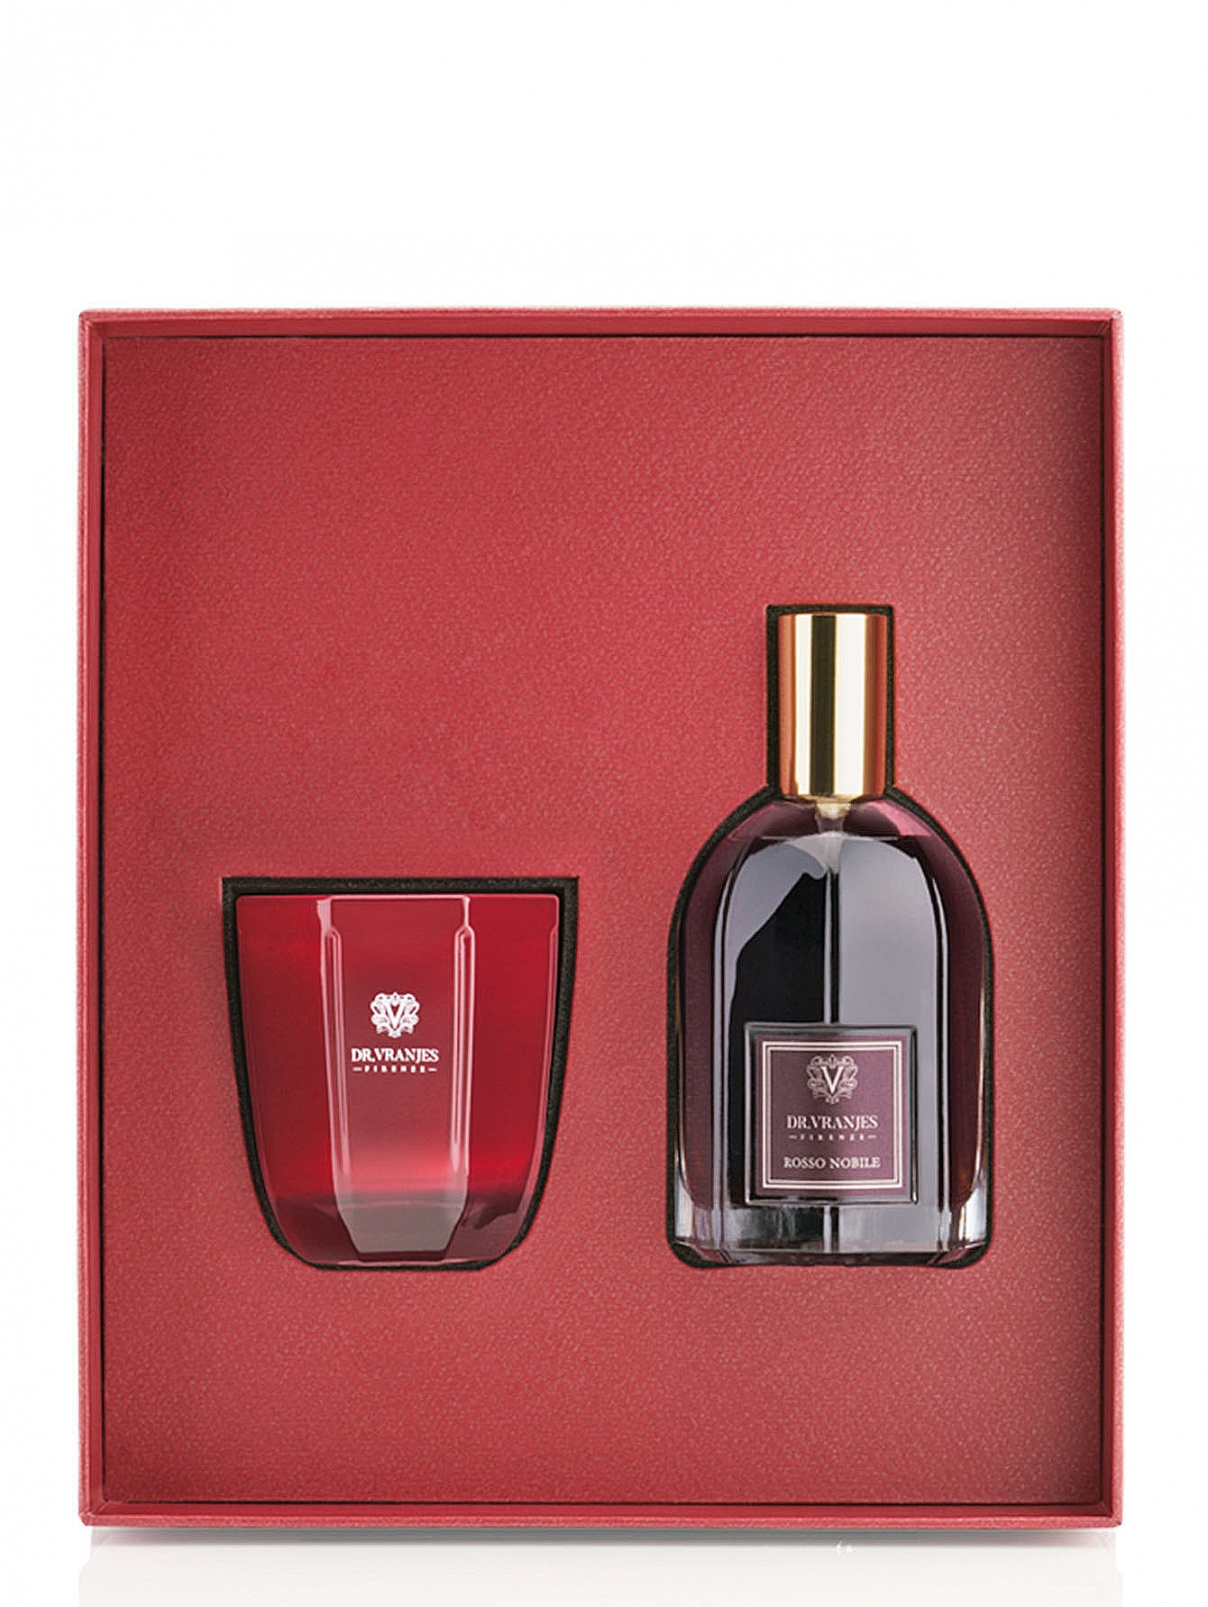 Набор свеча 80 г и спрей 100 мл Rosso Nobile Home Fragrance Dr. Vranjes  –  Общий вид